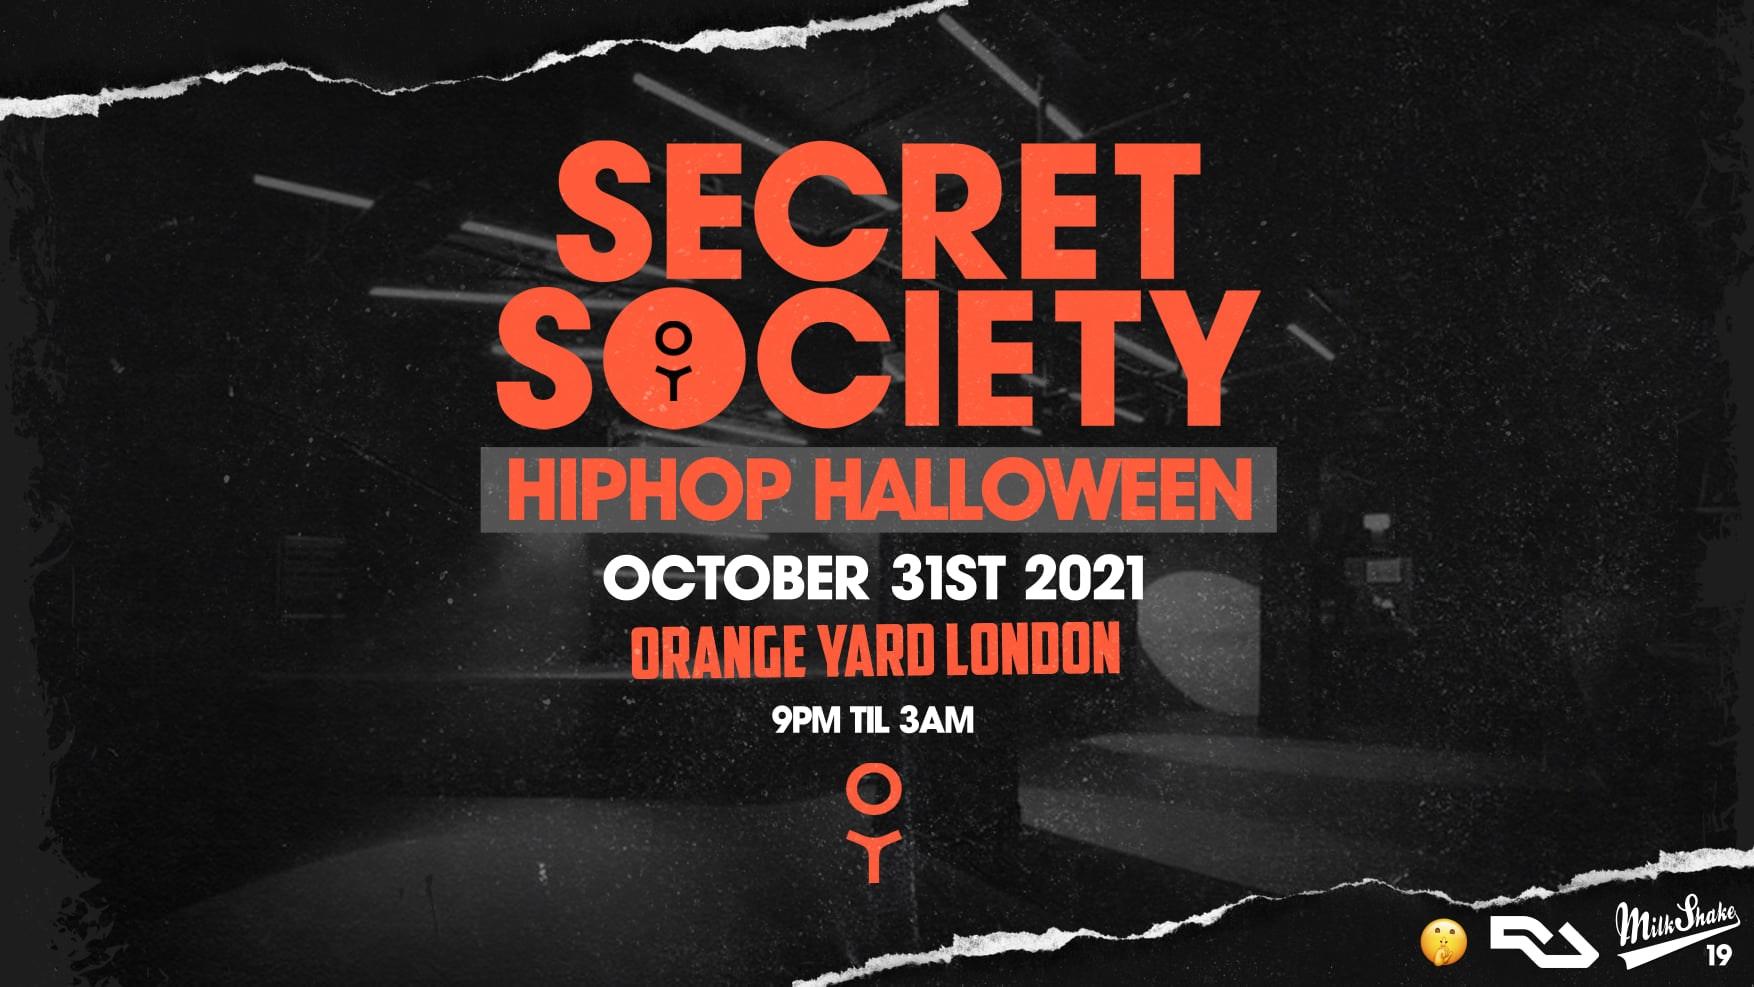 The Secret Society HipHop Halloween – Orange Yard   Oct 31st 2021